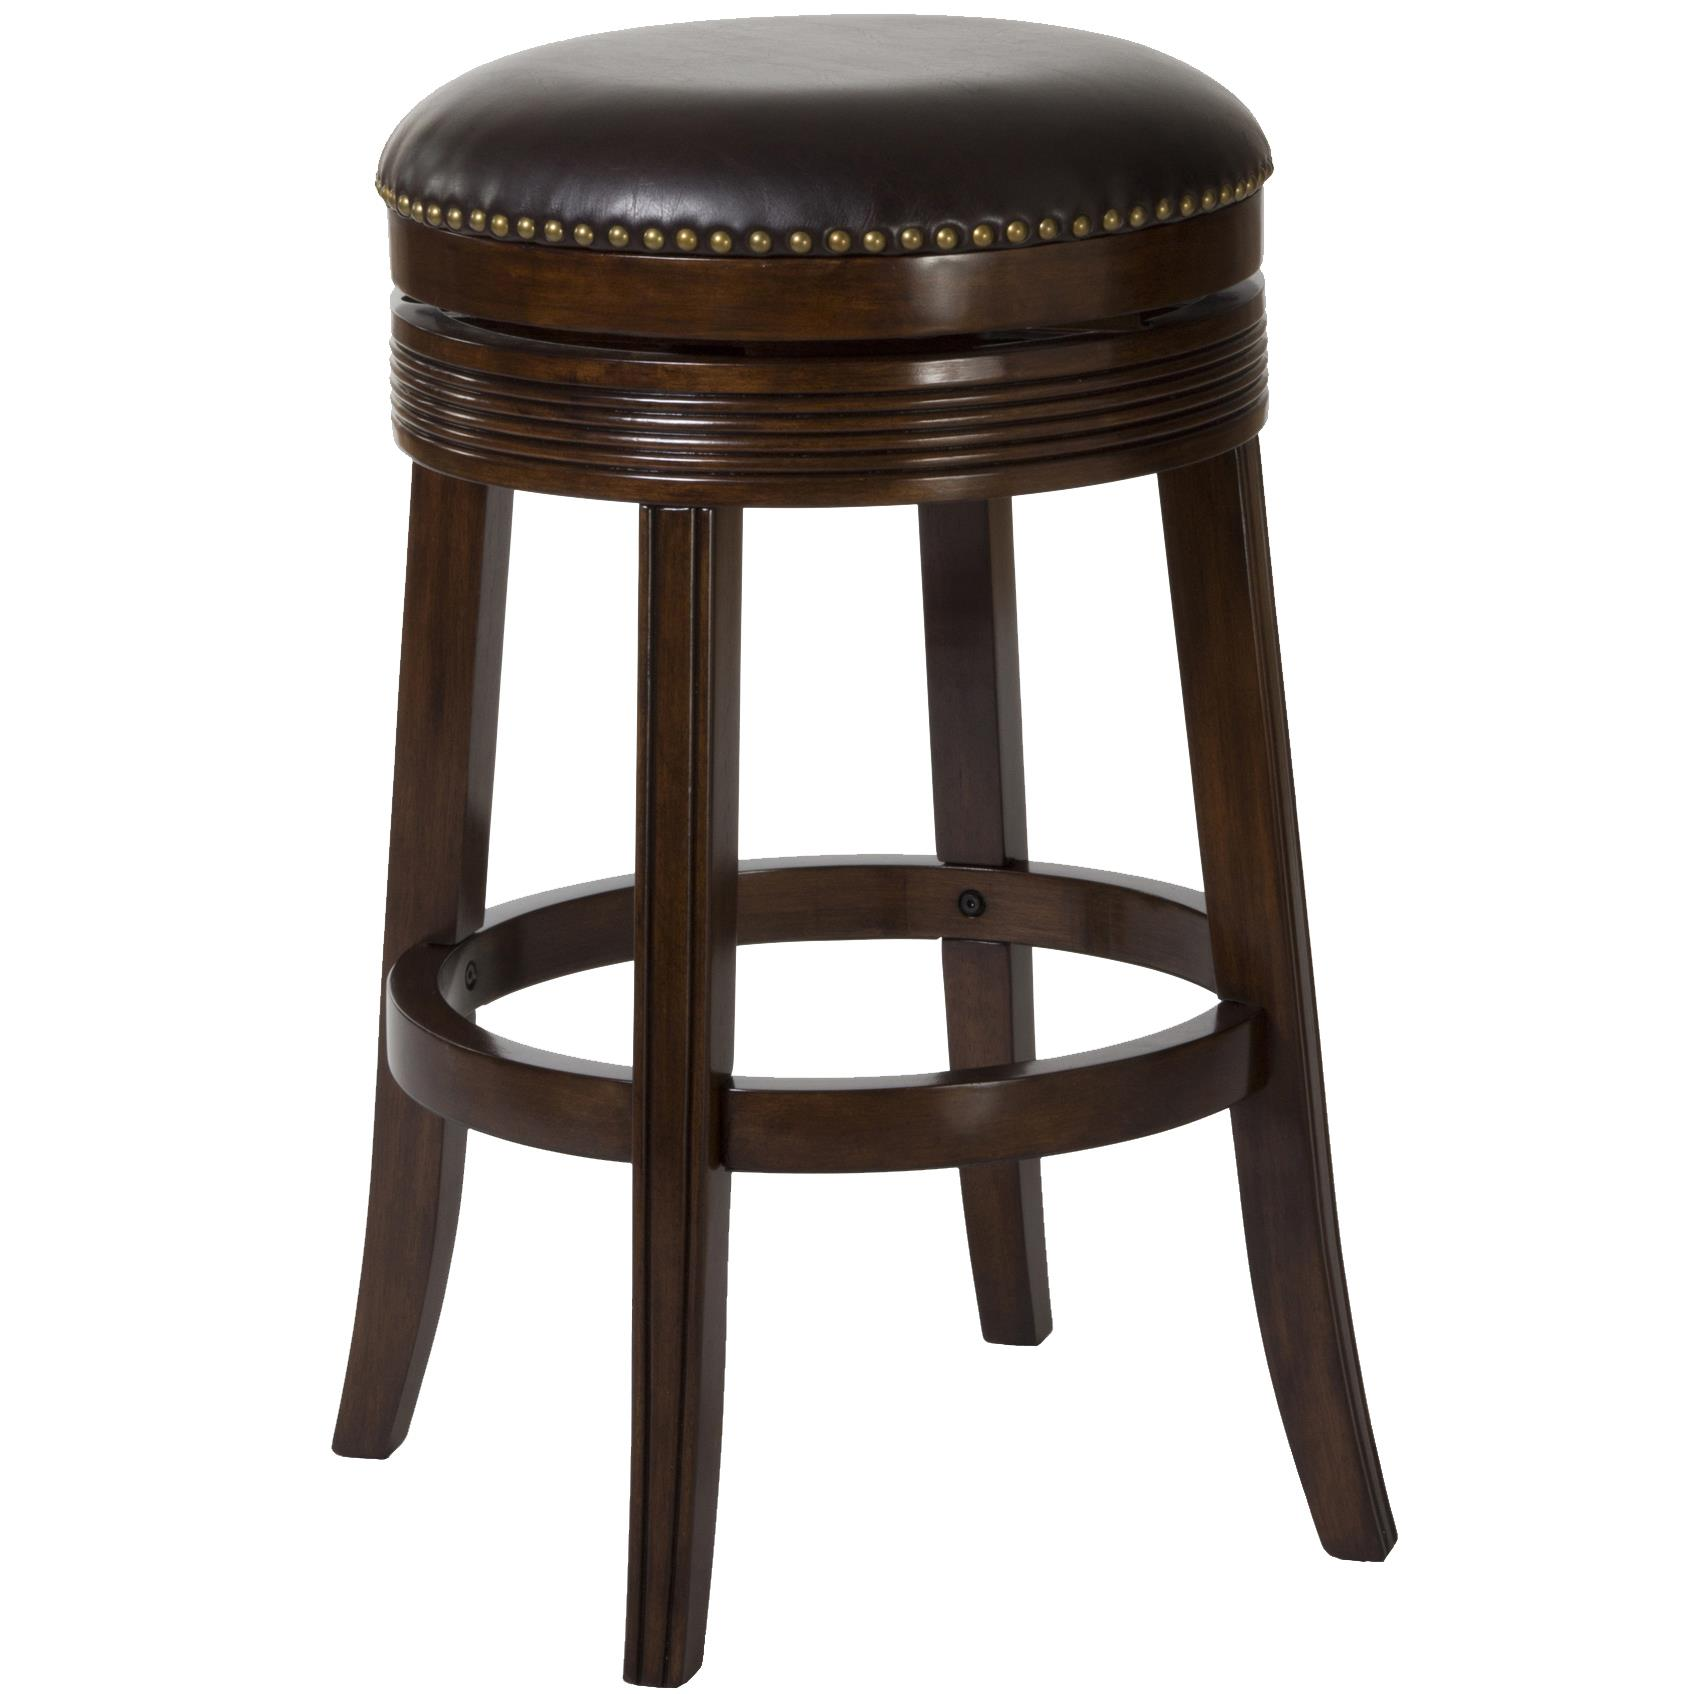 "Backless Bar Stools 26"" Tillman Counter Stool by Hillsdale at Crowley Furniture & Mattress"